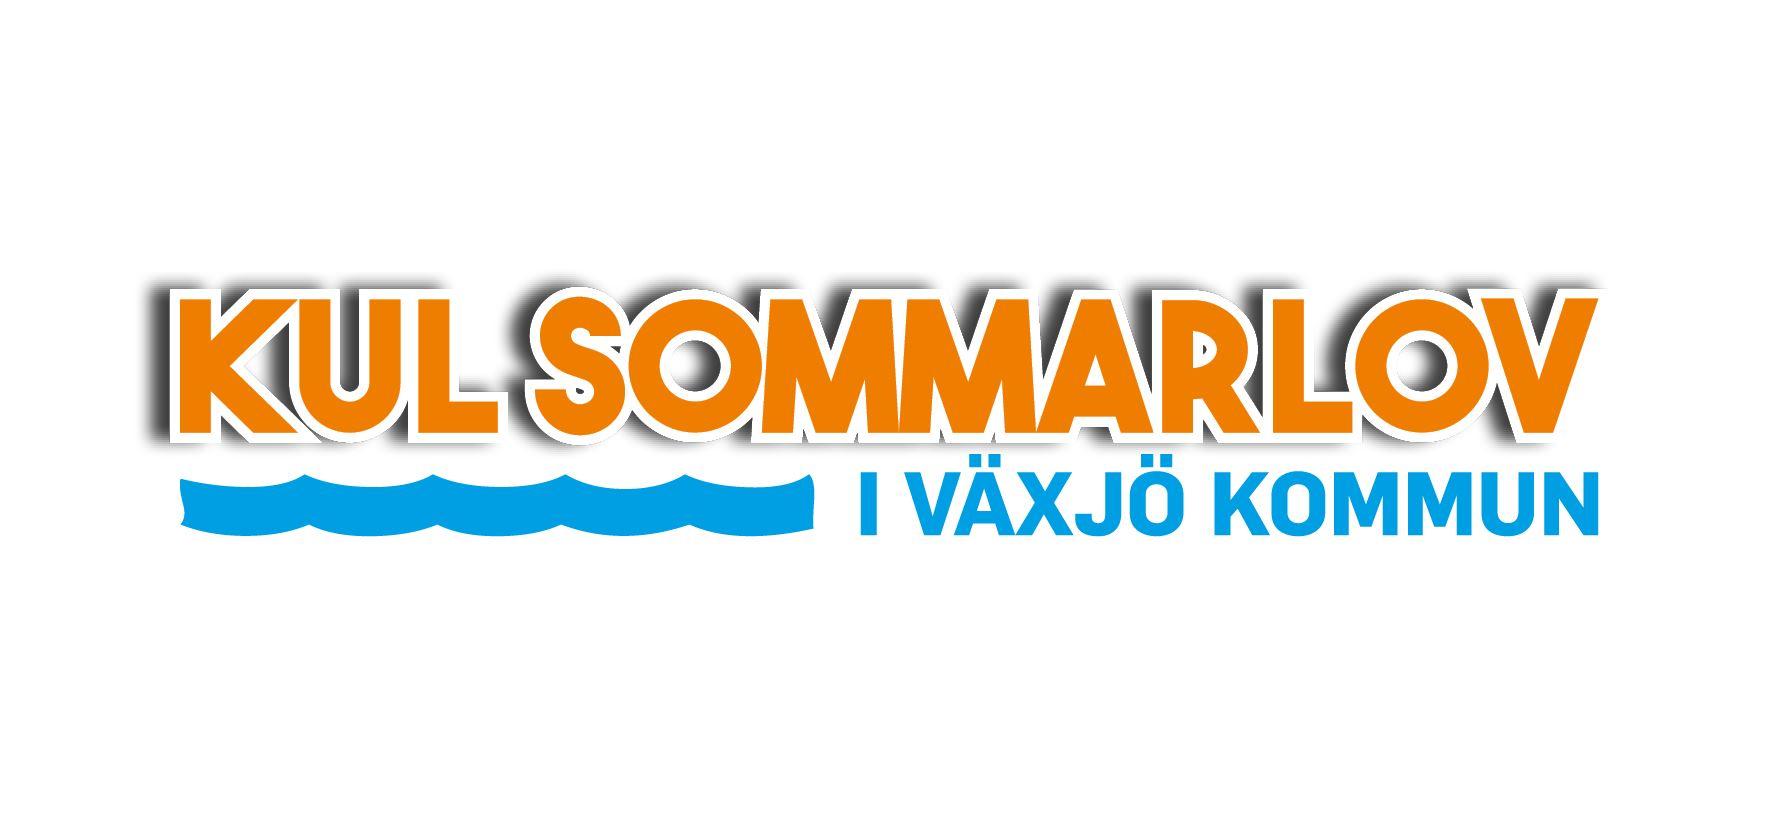 Kul sommarlov: Poolparty i Lammhult